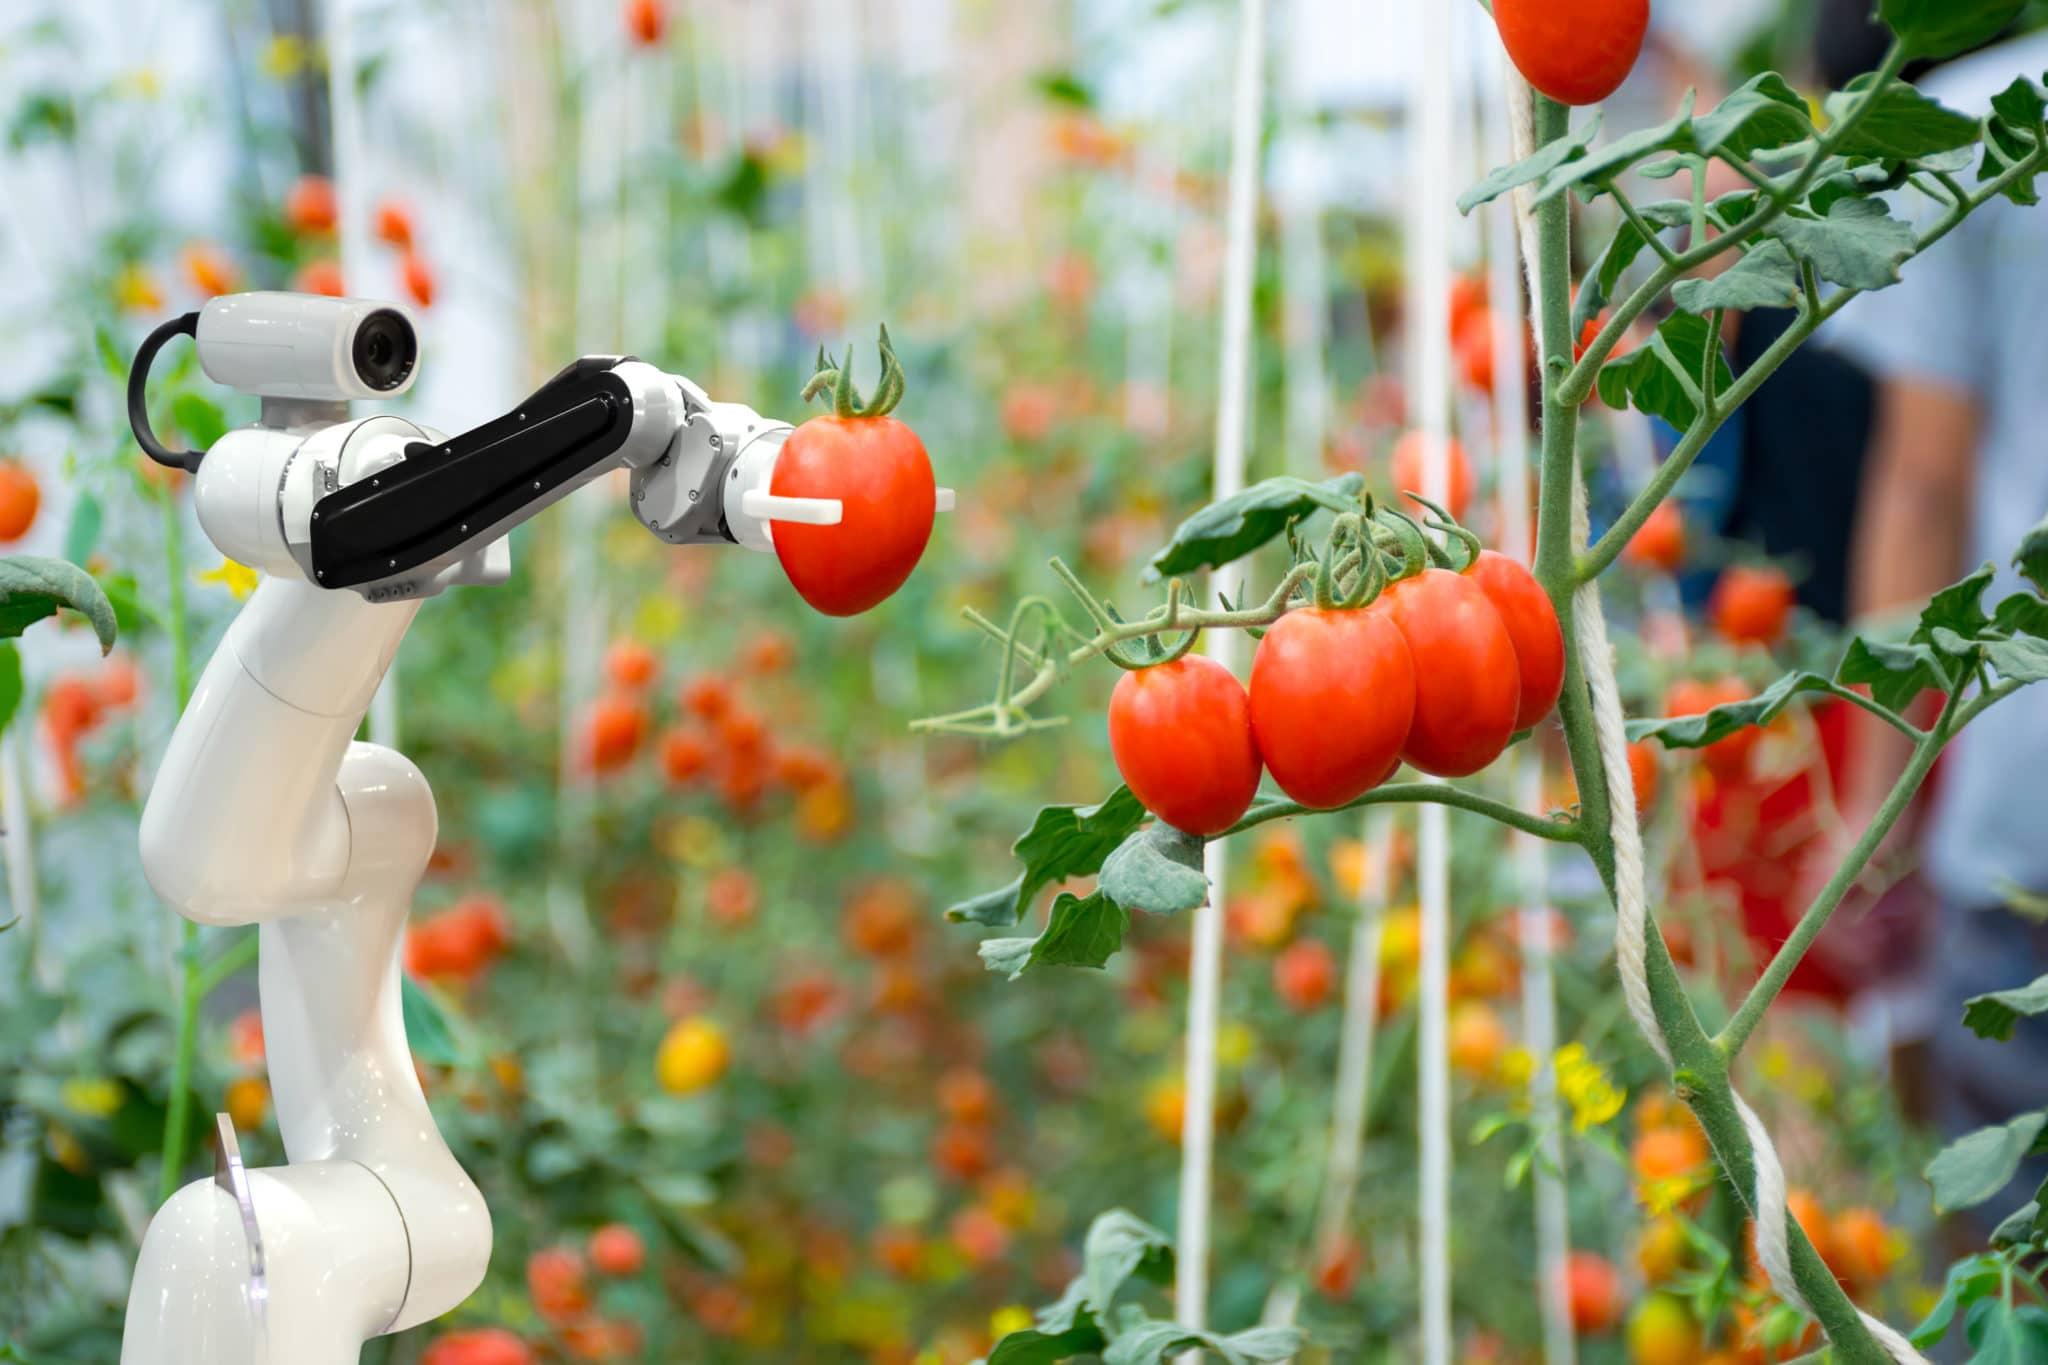 digital transformation food& beverage robot picking tomatoes